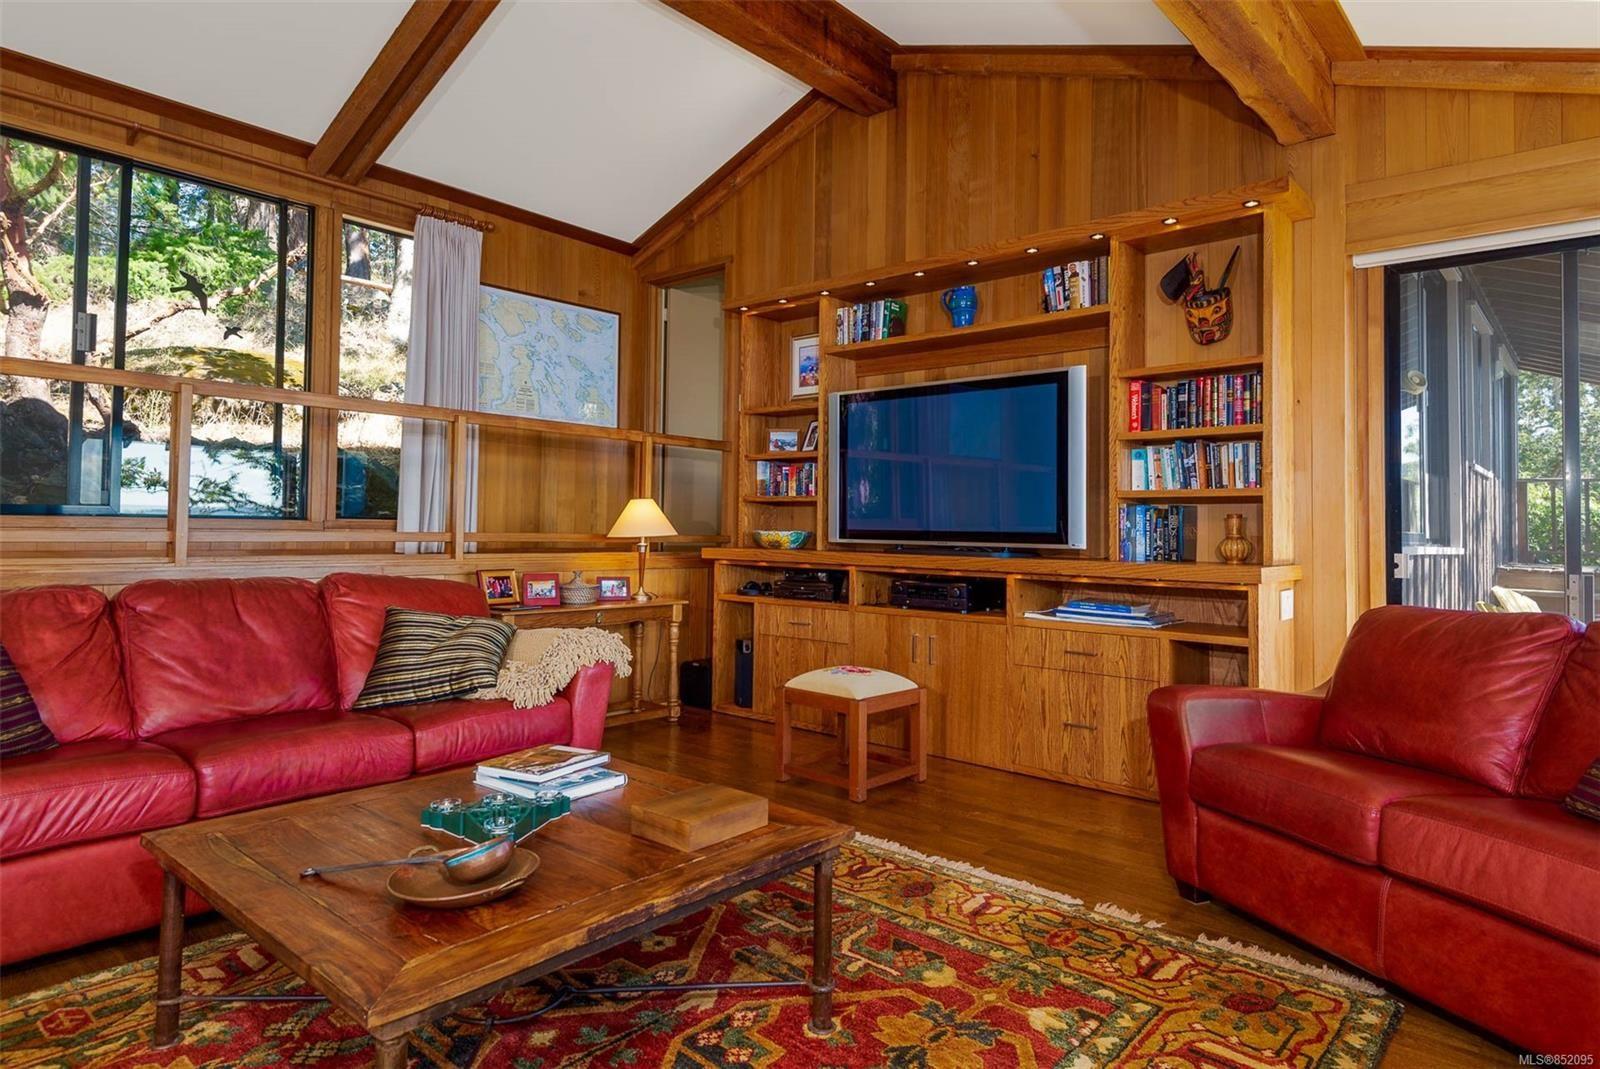 Photo 3: Photos: 236 McGill Rd in : GI Salt Spring House for sale (Gulf Islands)  : MLS®# 852095